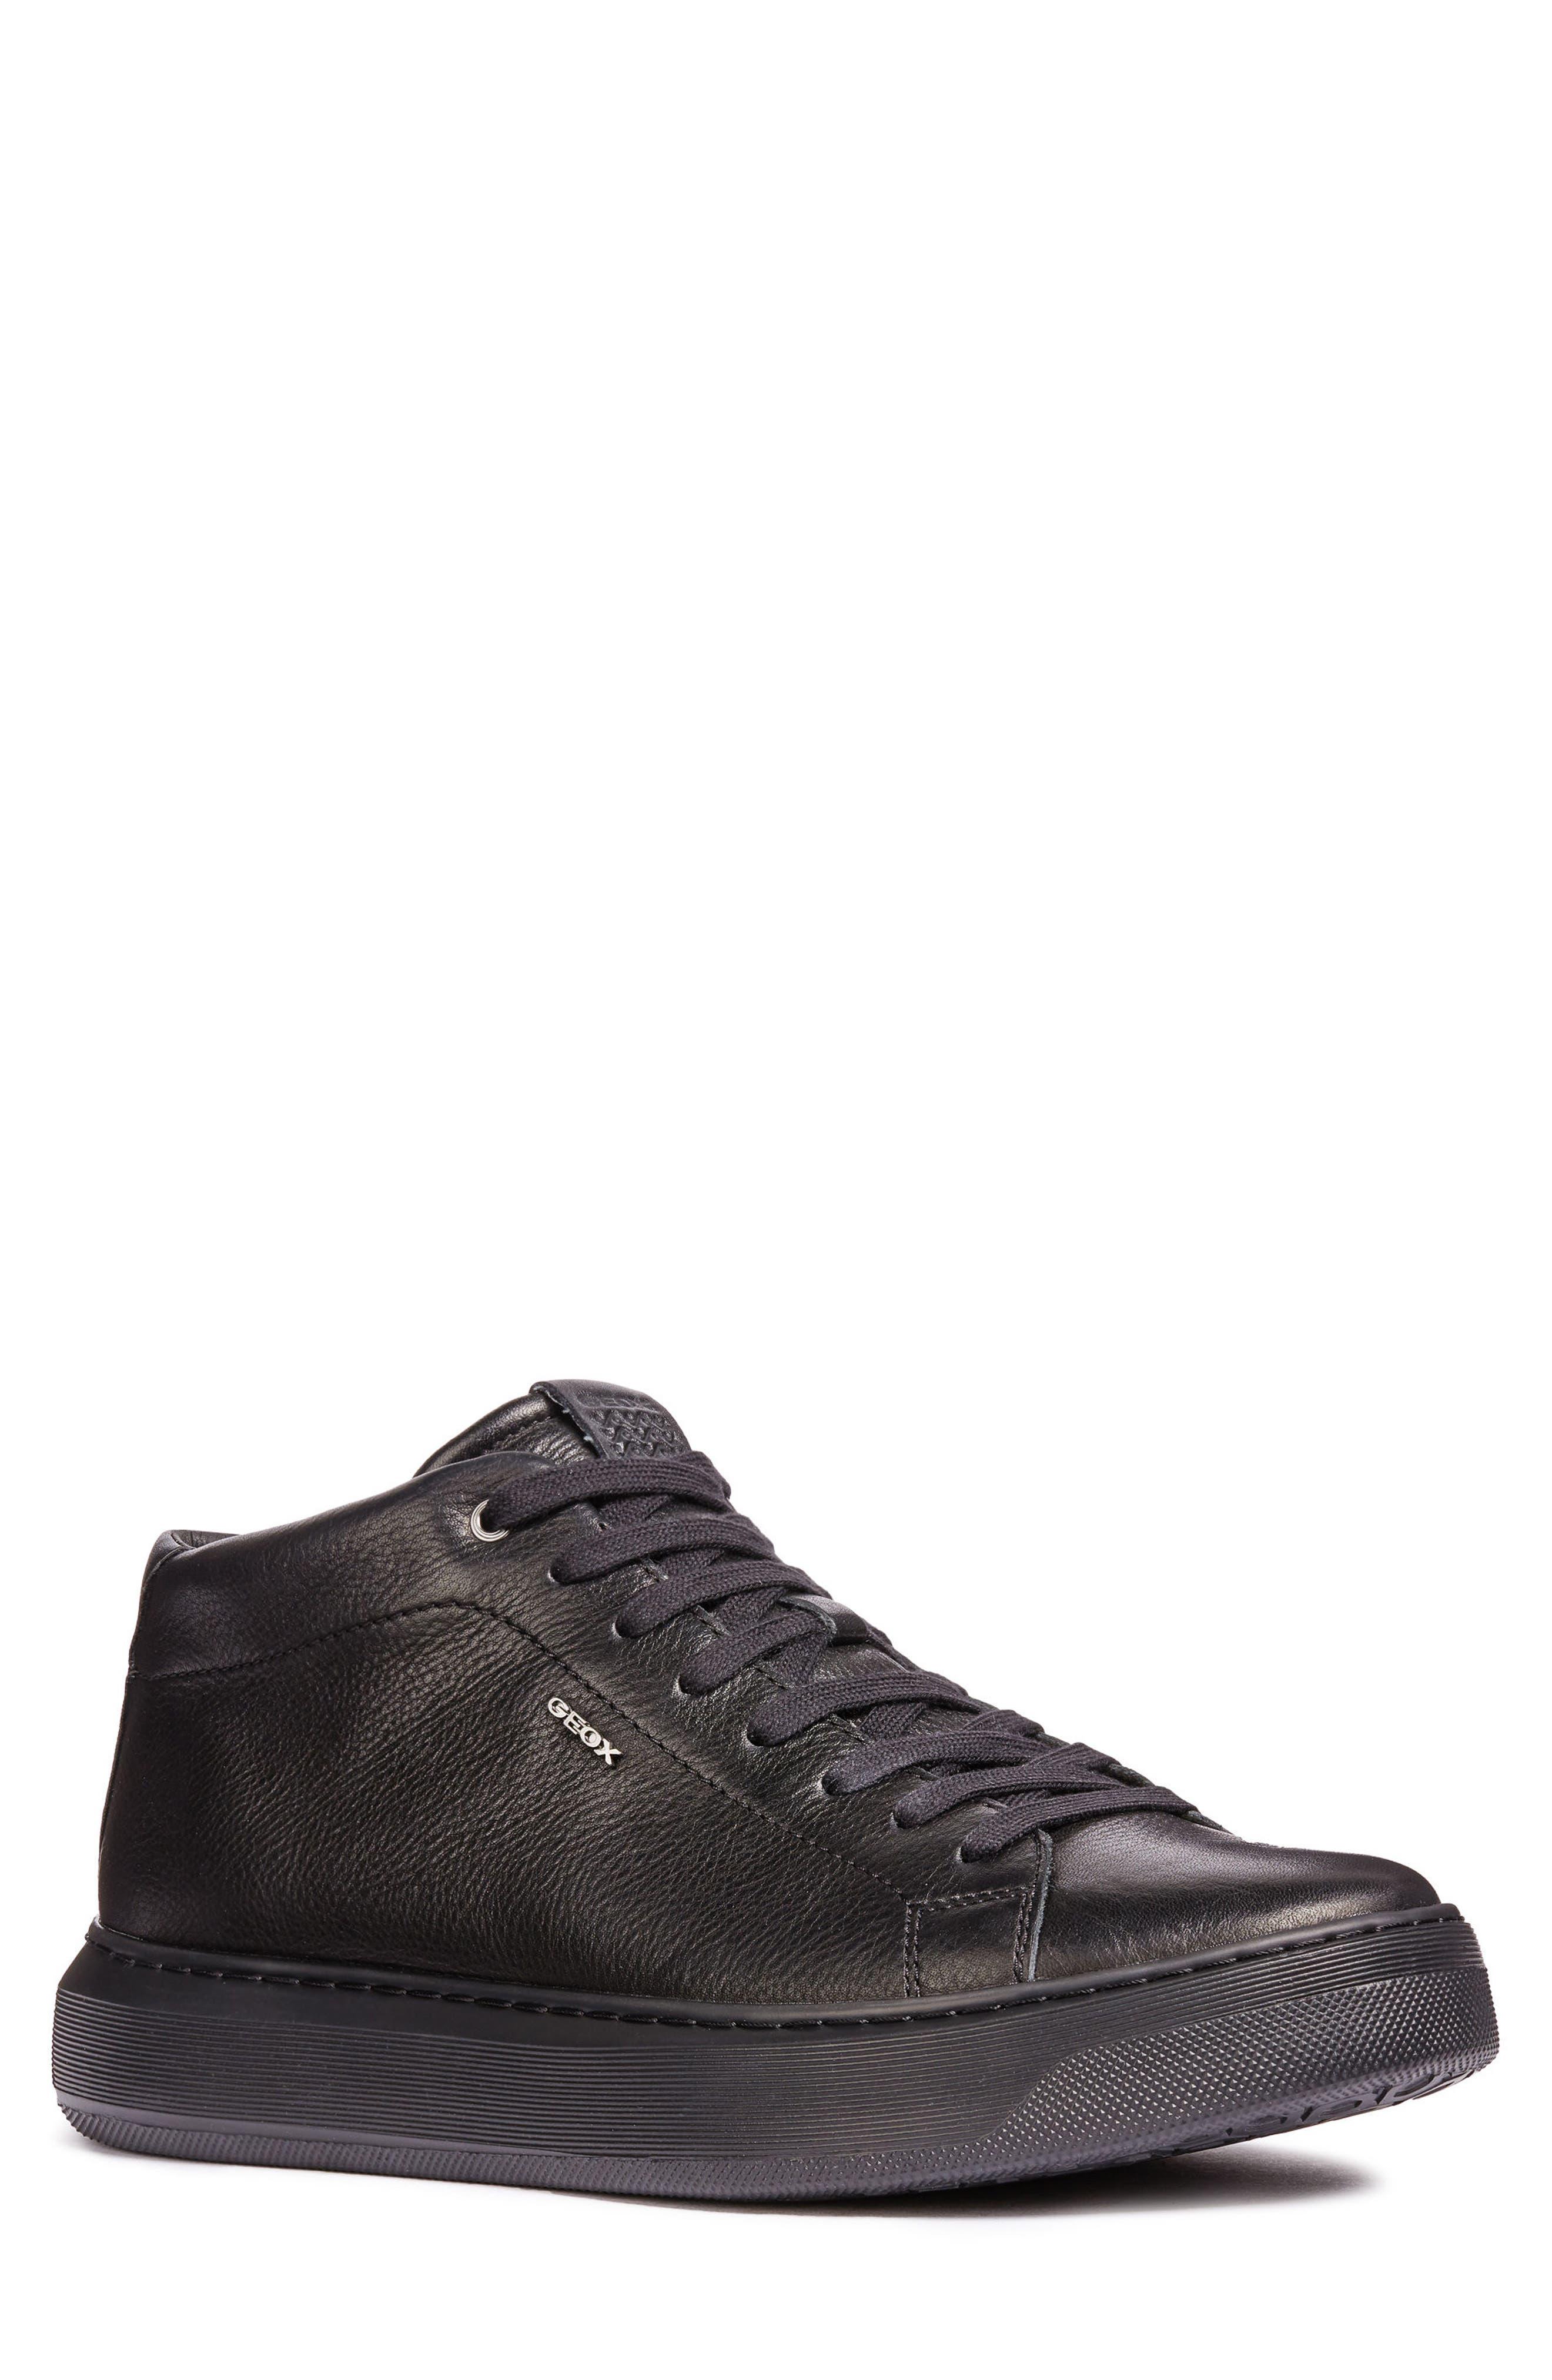 Geox Deiven 1 High Top Sneaker, Black